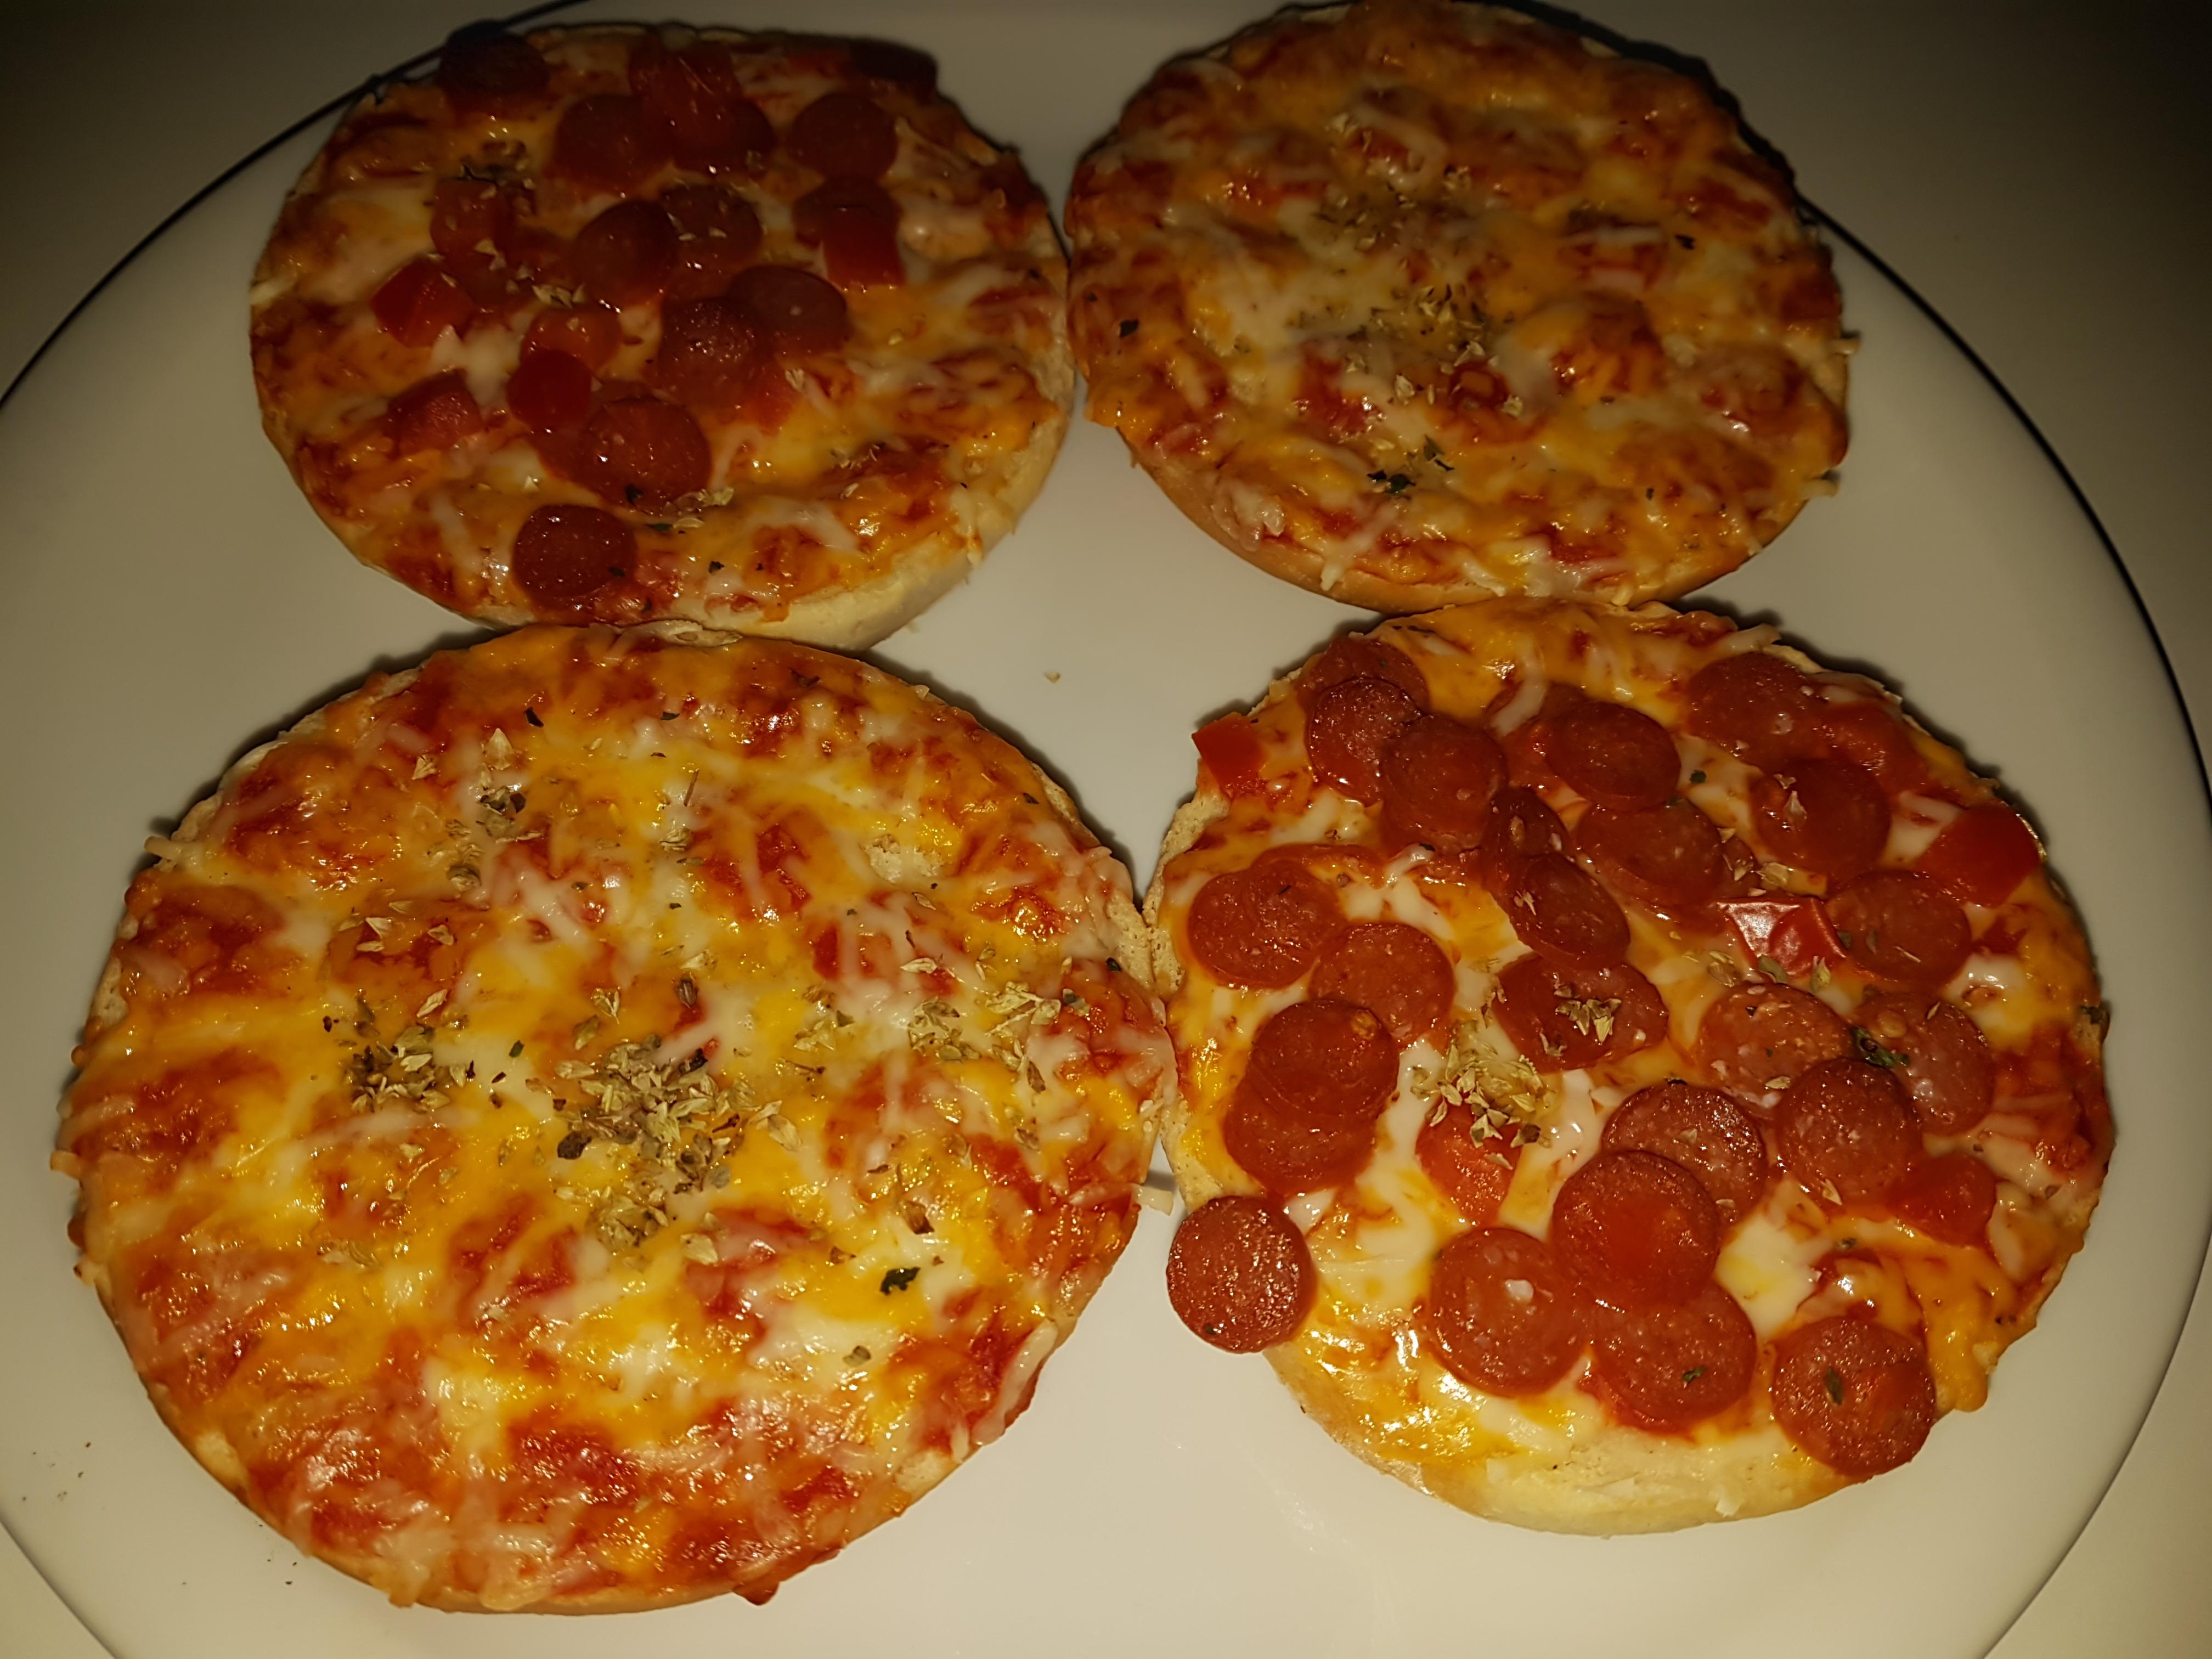 https://foodloader.net/Holz_2018-05-01_Pizzaburger.jpg